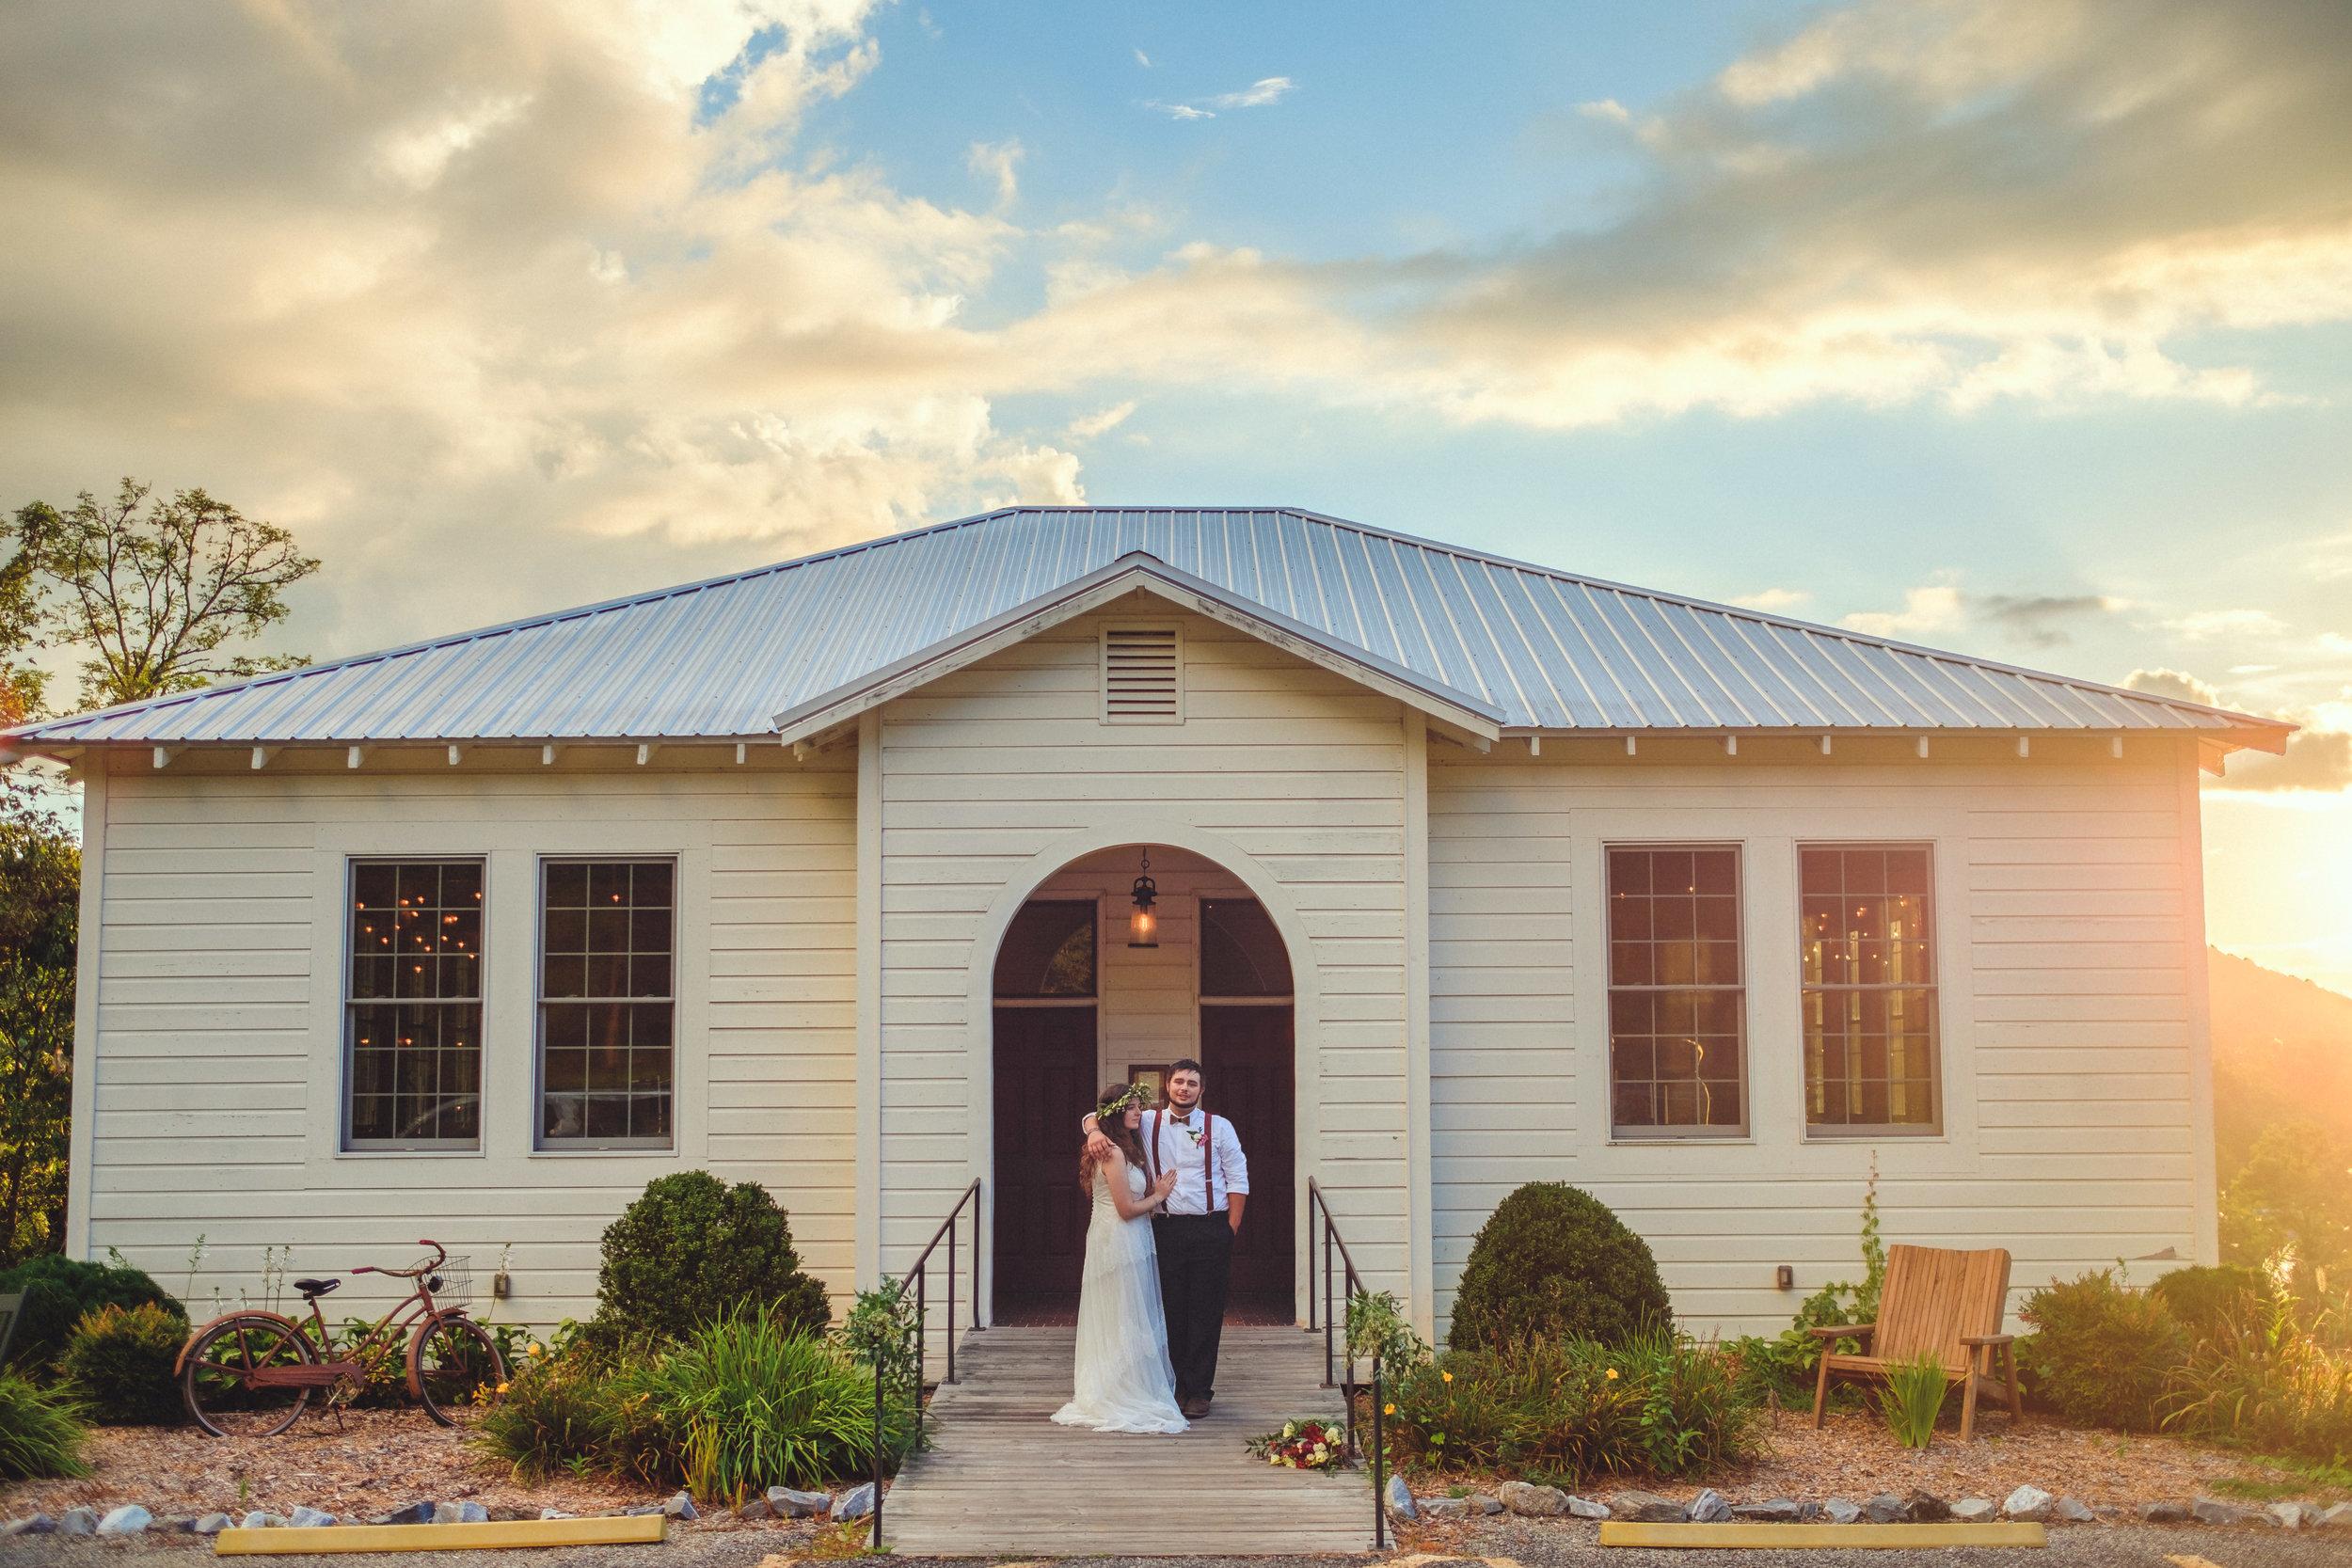 Choestoe School House wedding Blairsville Georgia